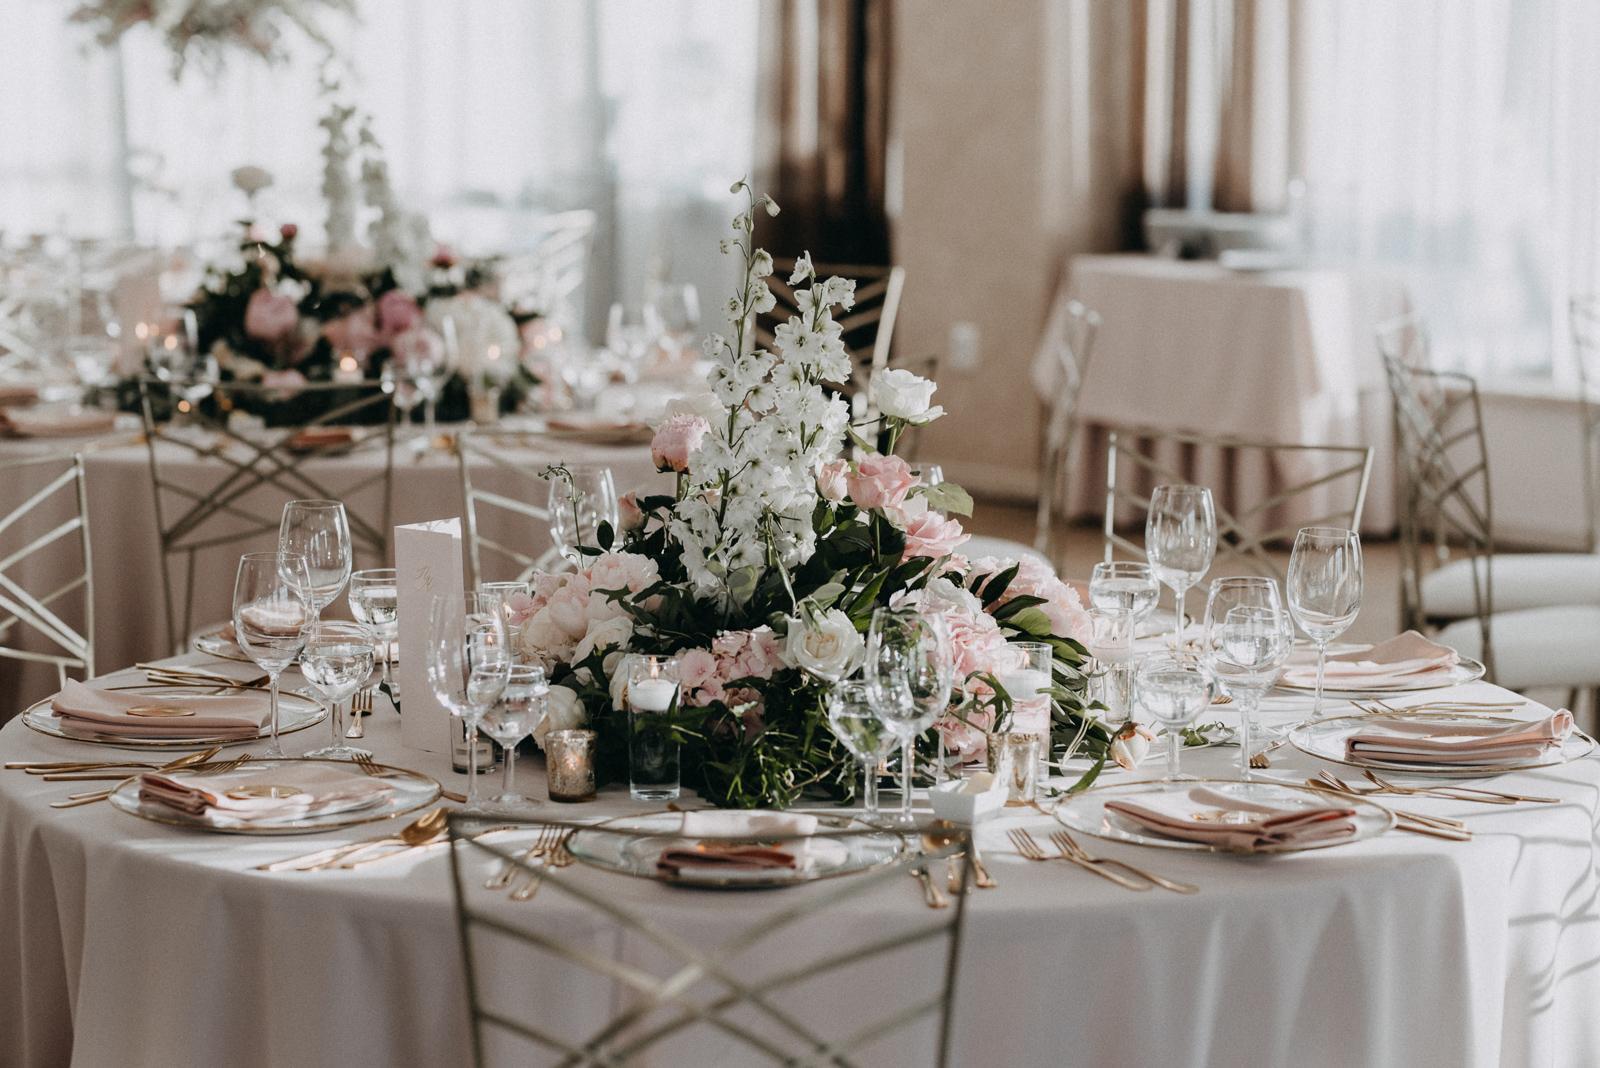 terezaklizanova_weddings - Obrázok č. 8